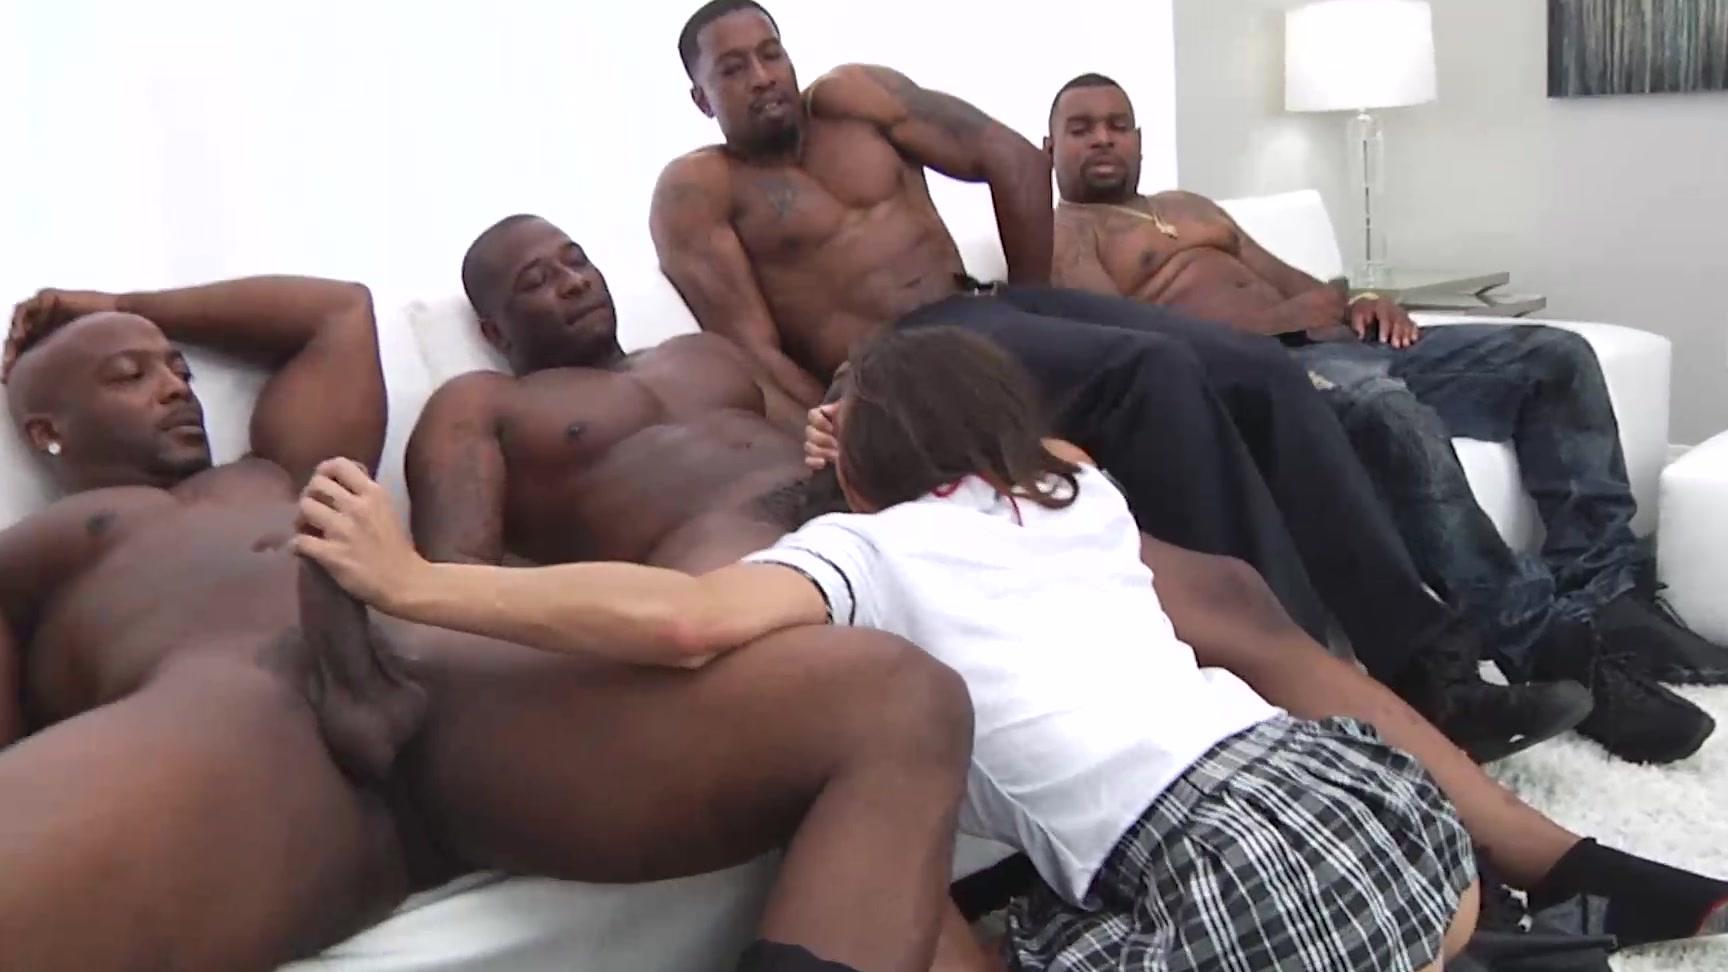 Lustige Porno-Videos